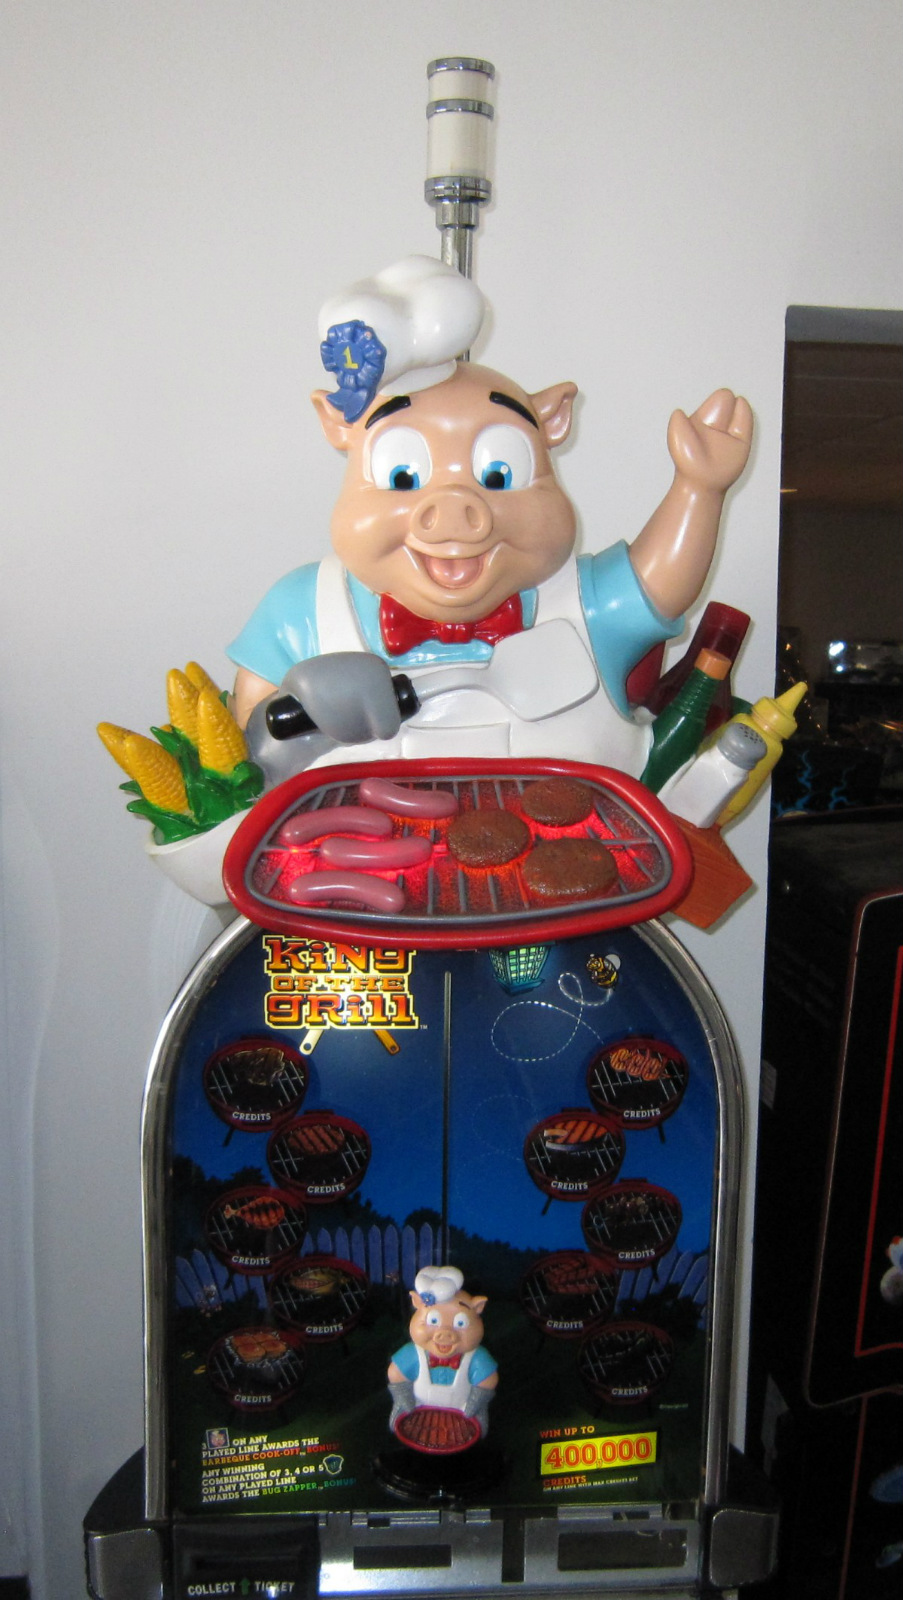 fun slot machines